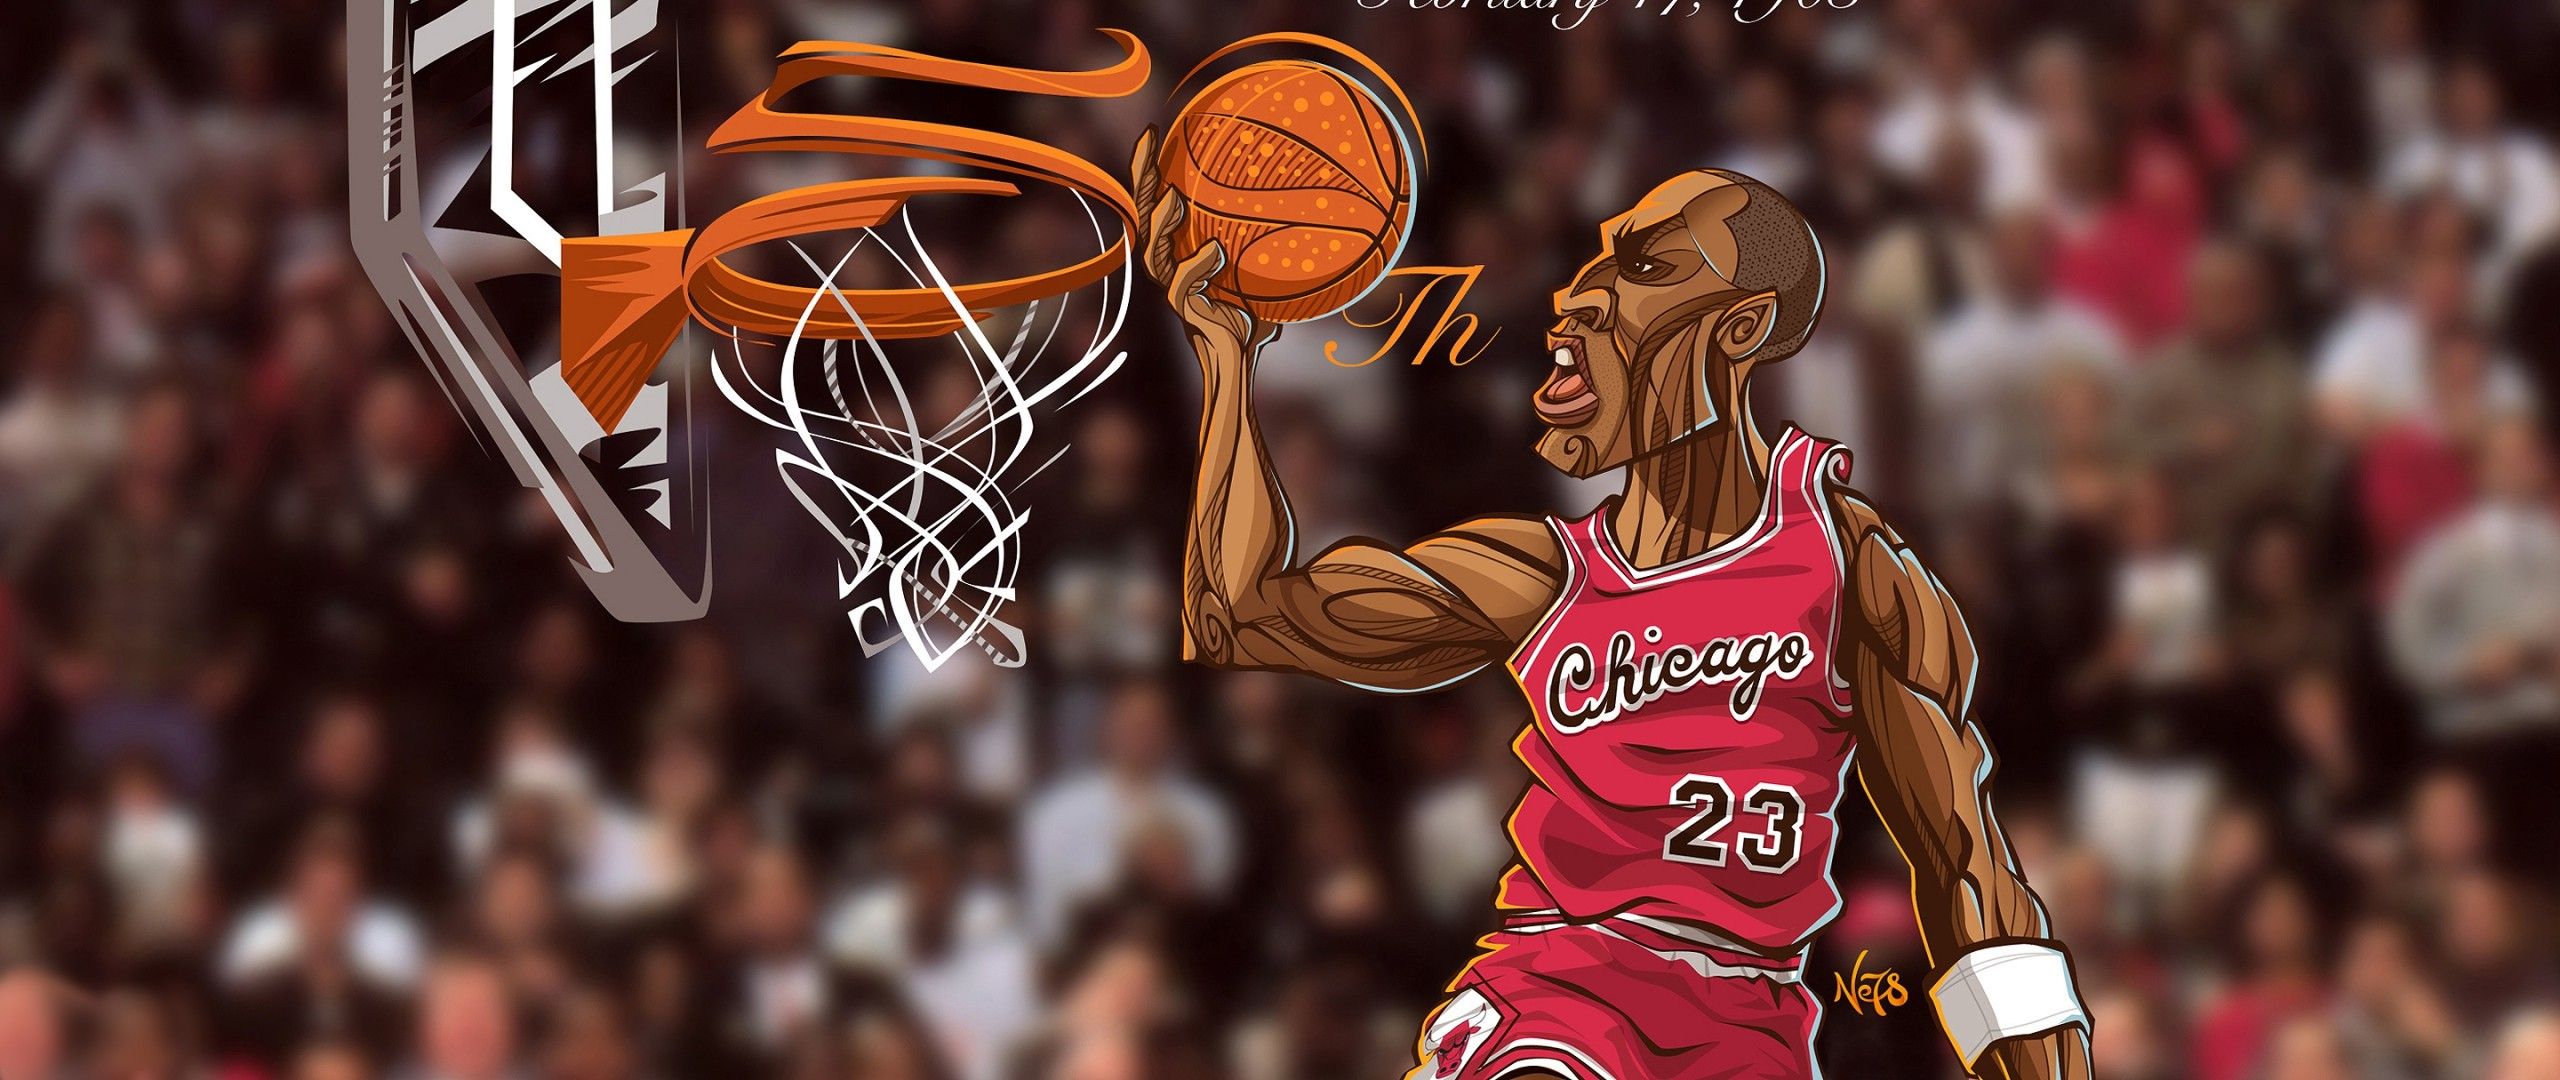 Michael Jordan wallpaper ·① Download free awesome High ...